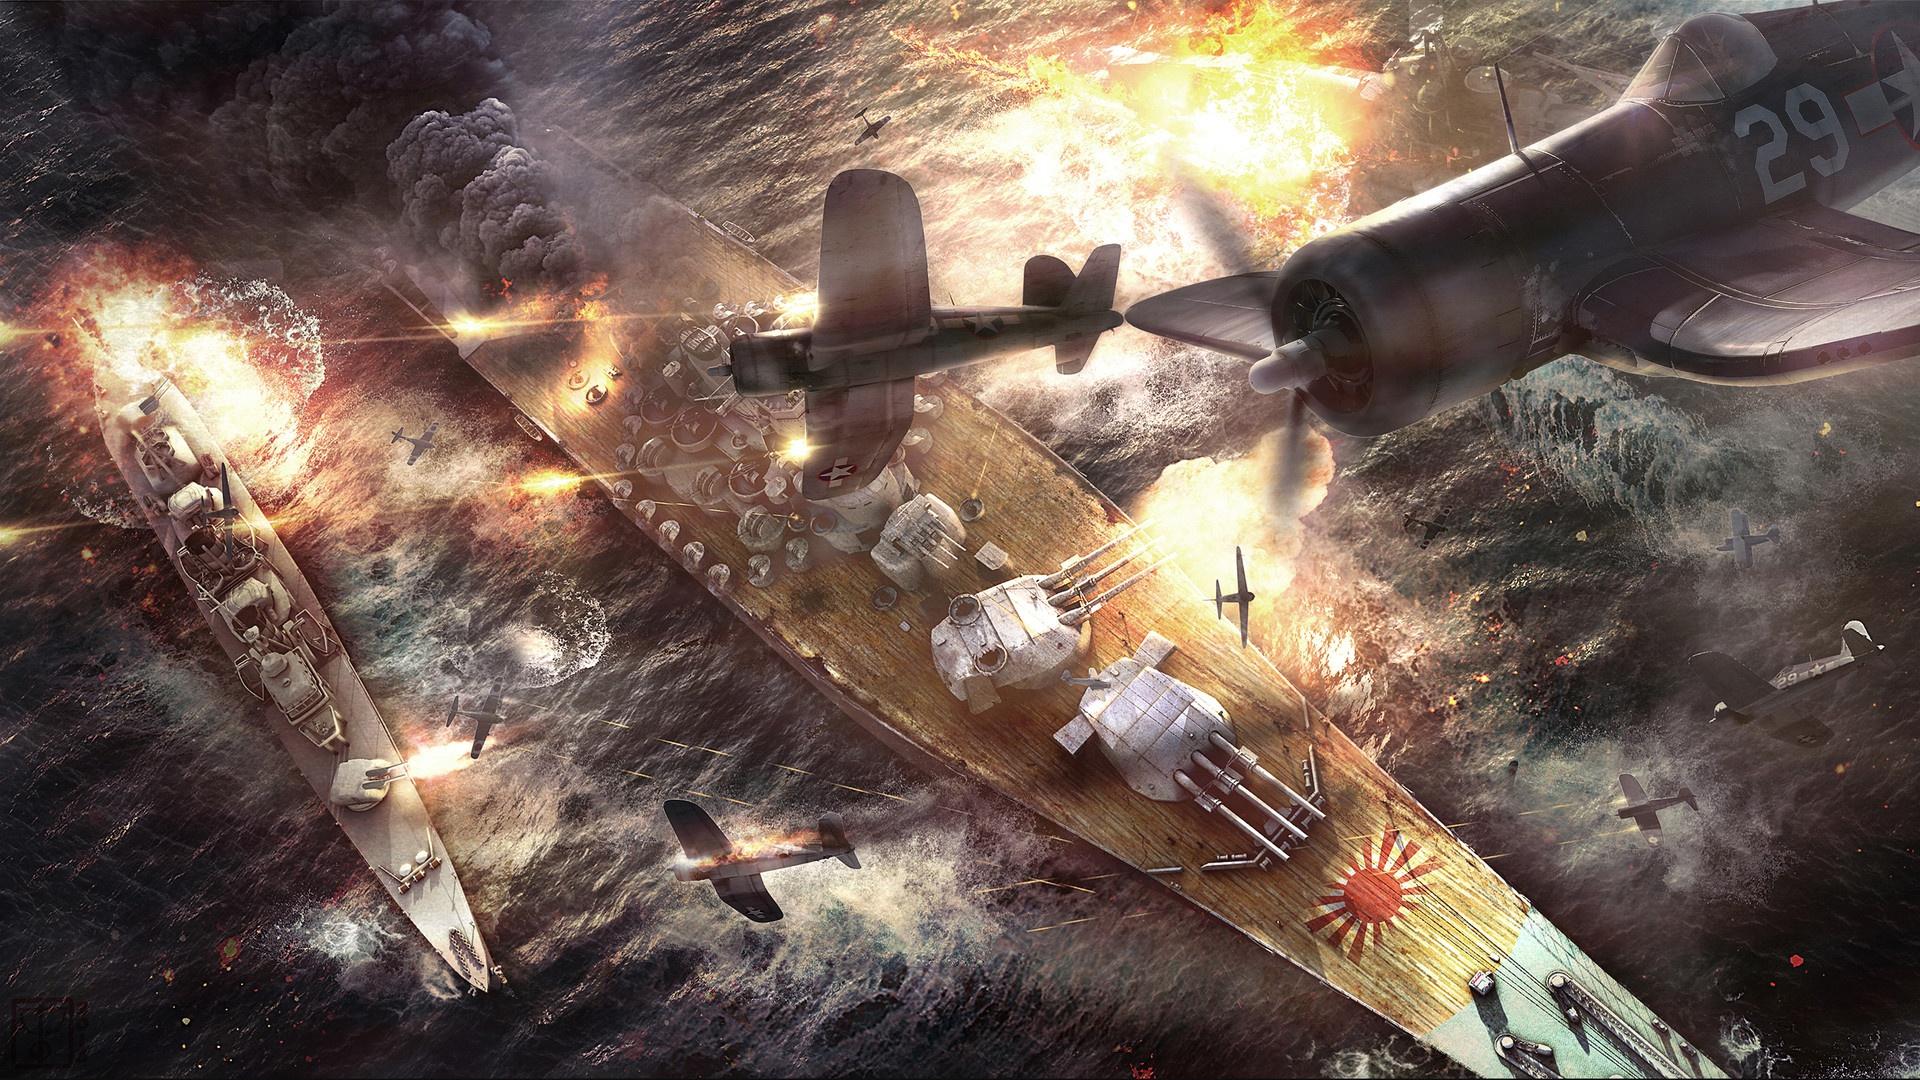 battle hd wallpaper background image 1920x1080 id